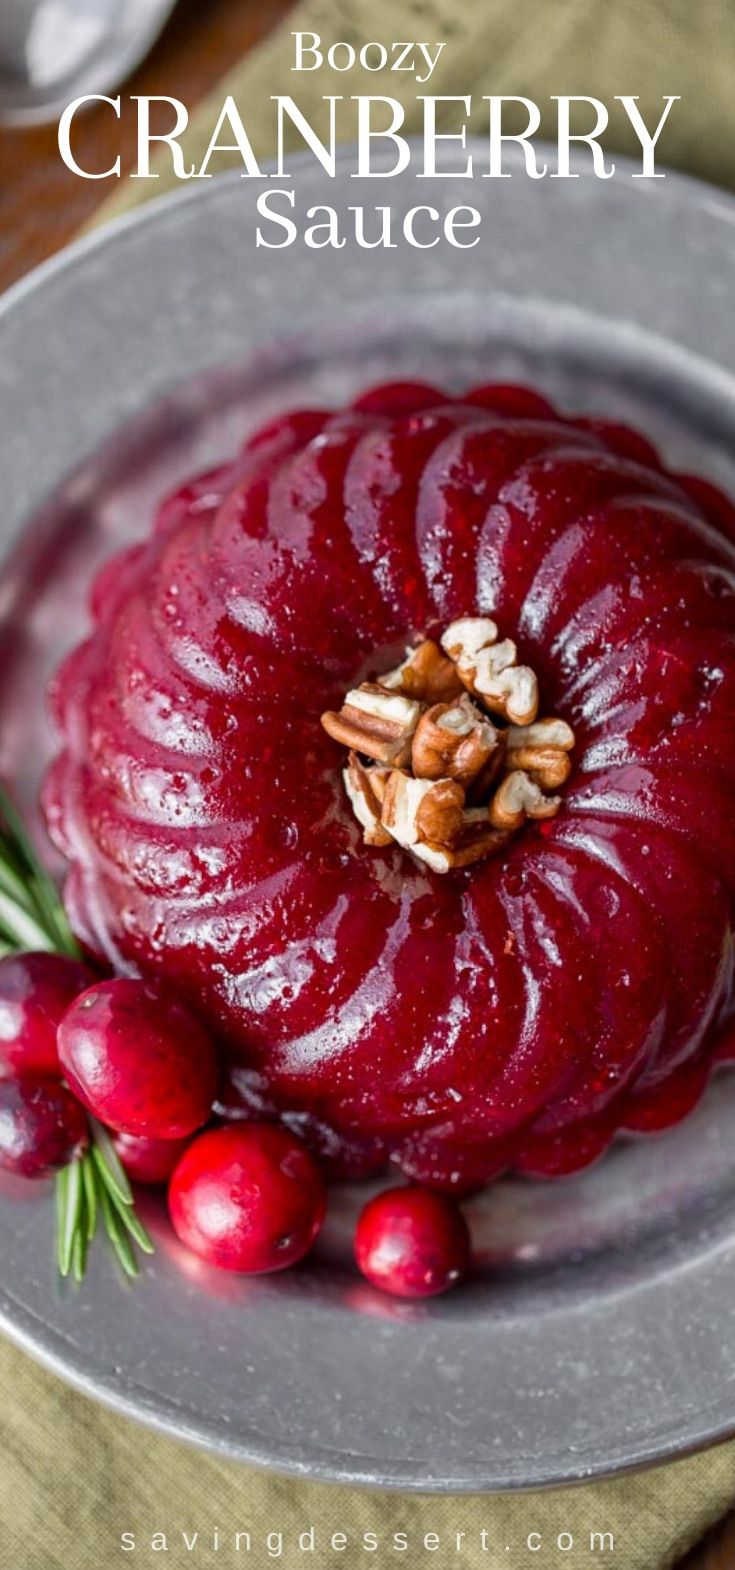 Boozy Cranberry Sauce Recipe Berries Recipes